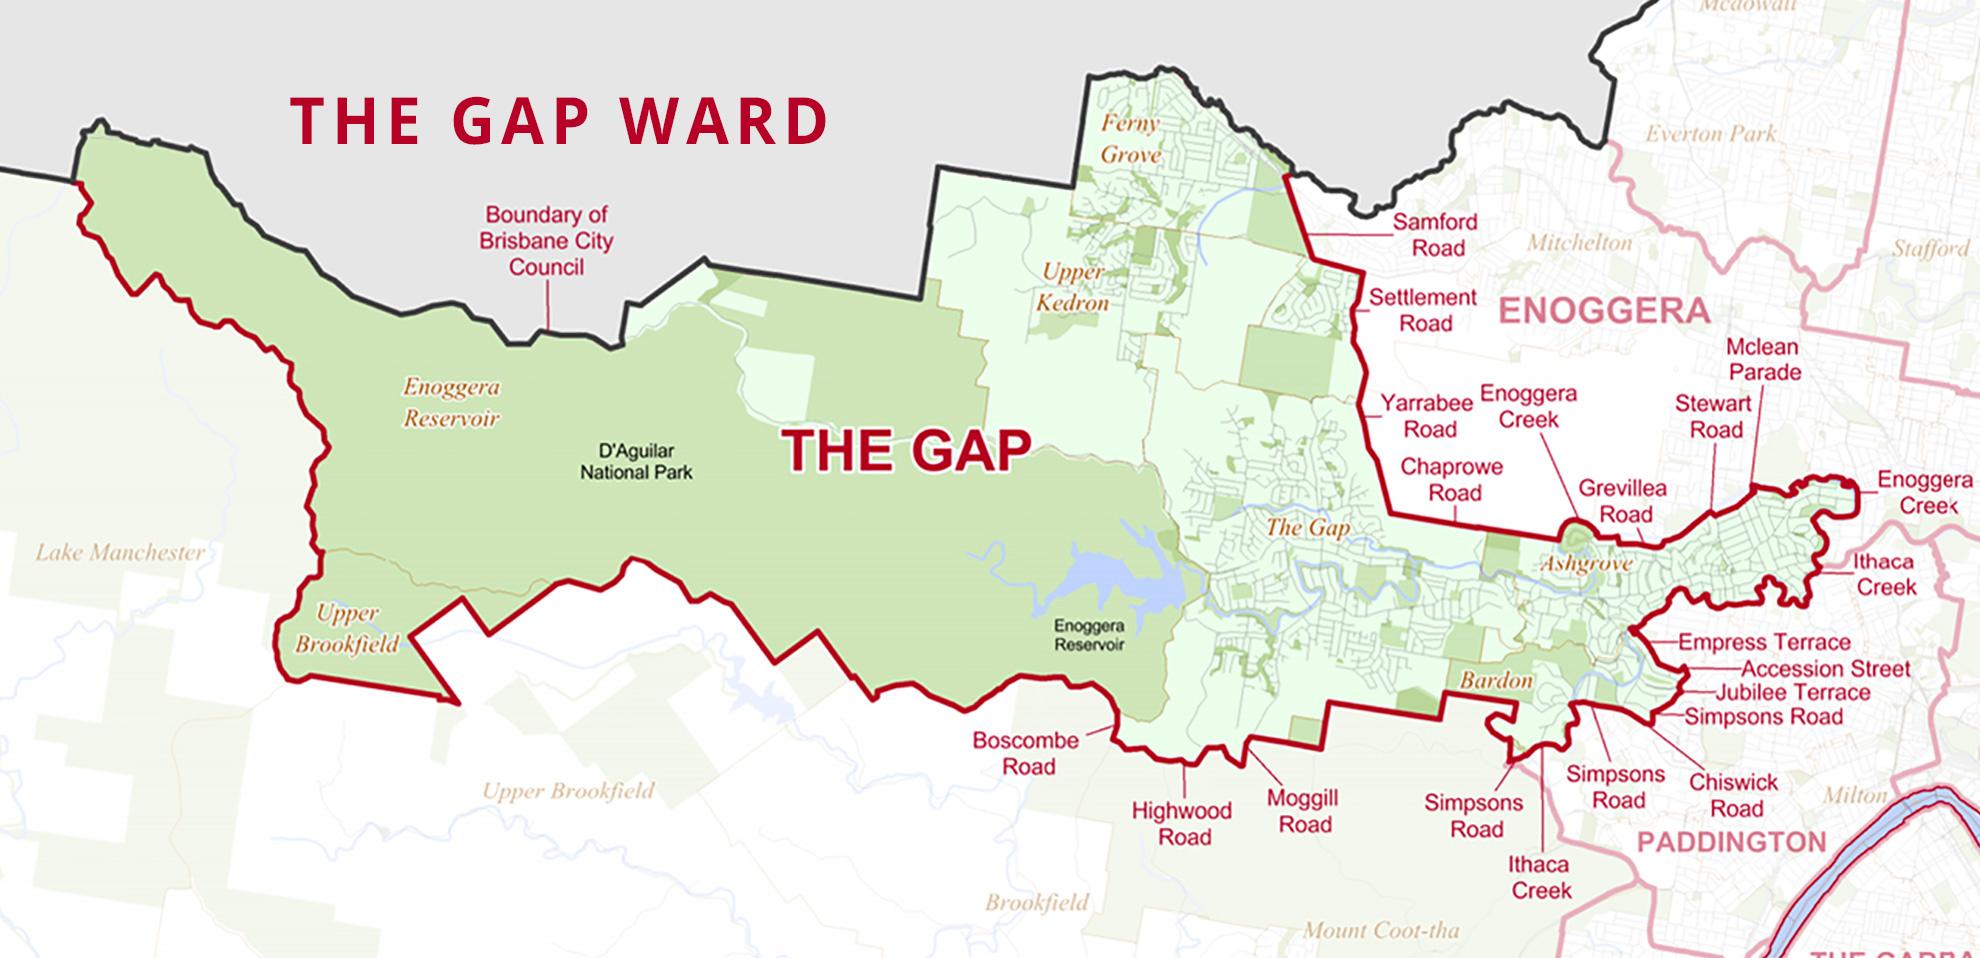 The Gap Ward map